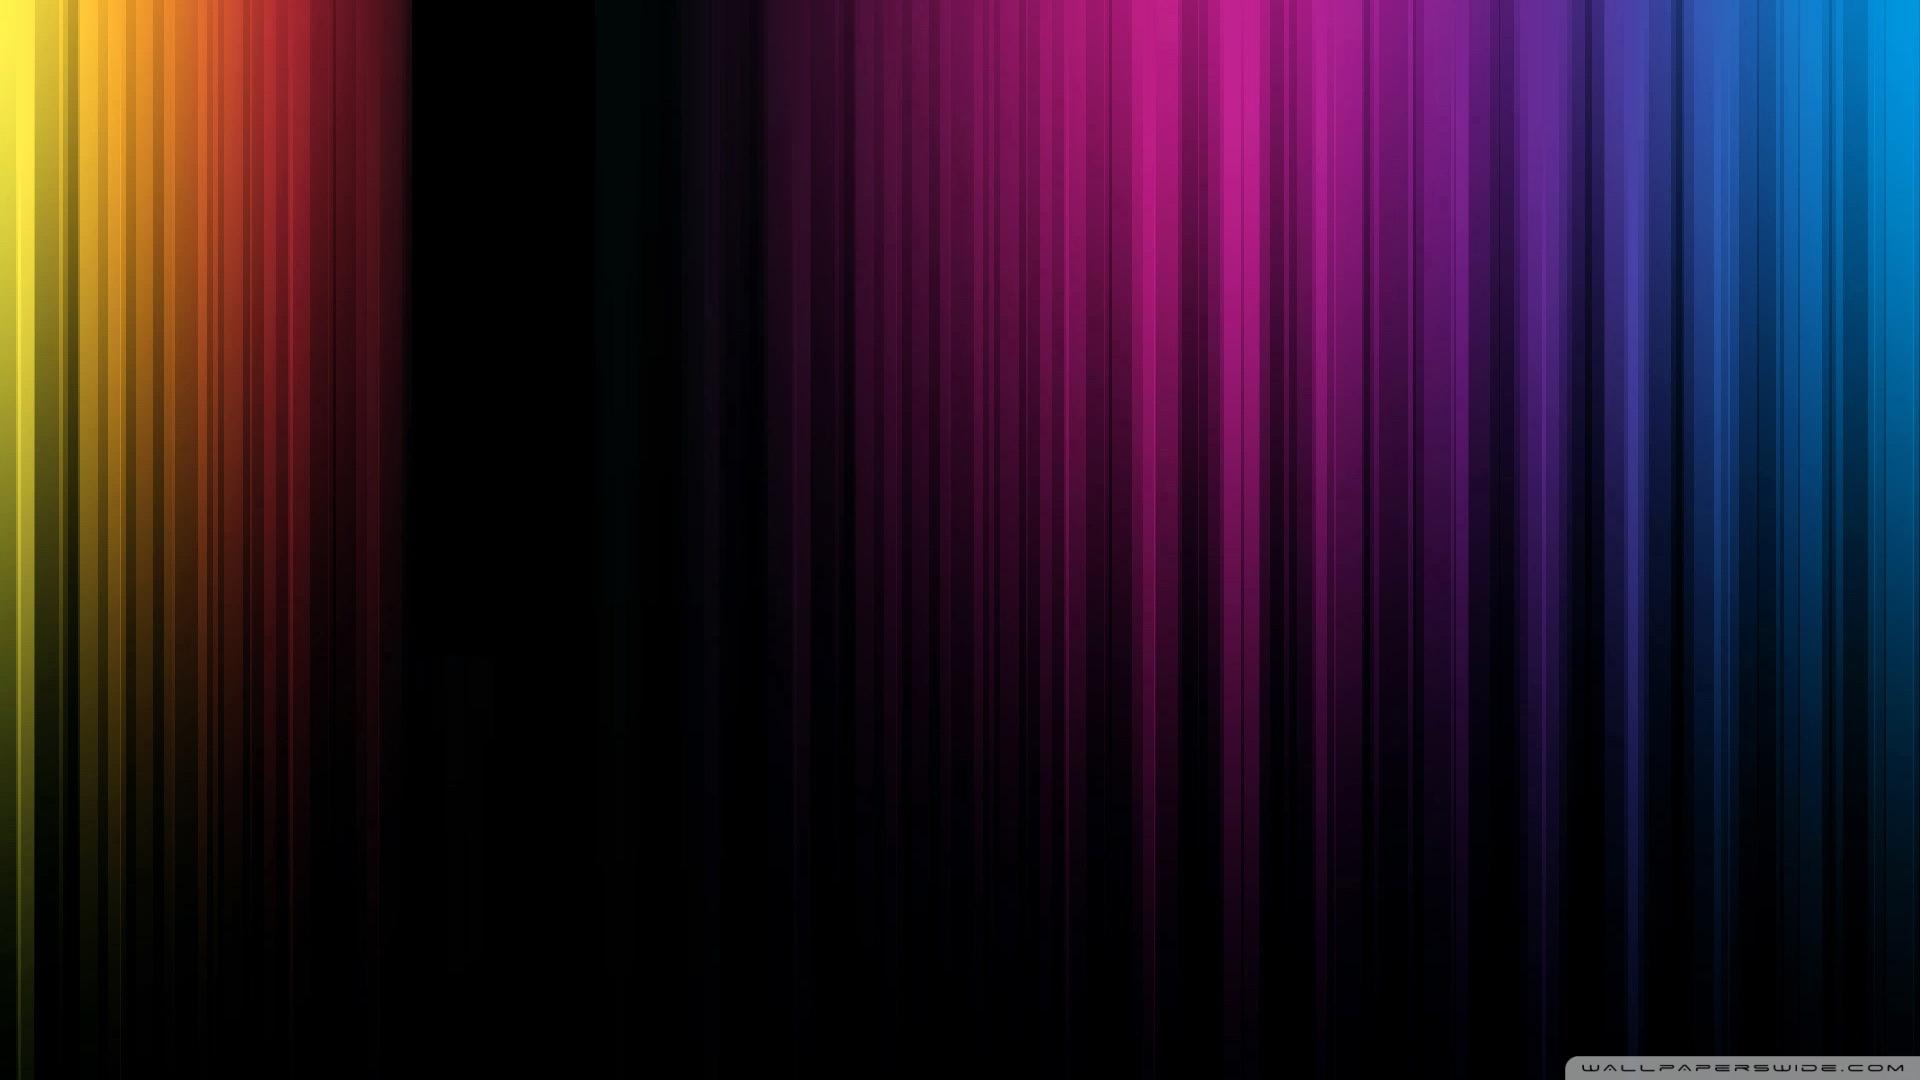 Download Colorful Stripes Wallpaper 1920x1080 Wallpoper 1920x1080